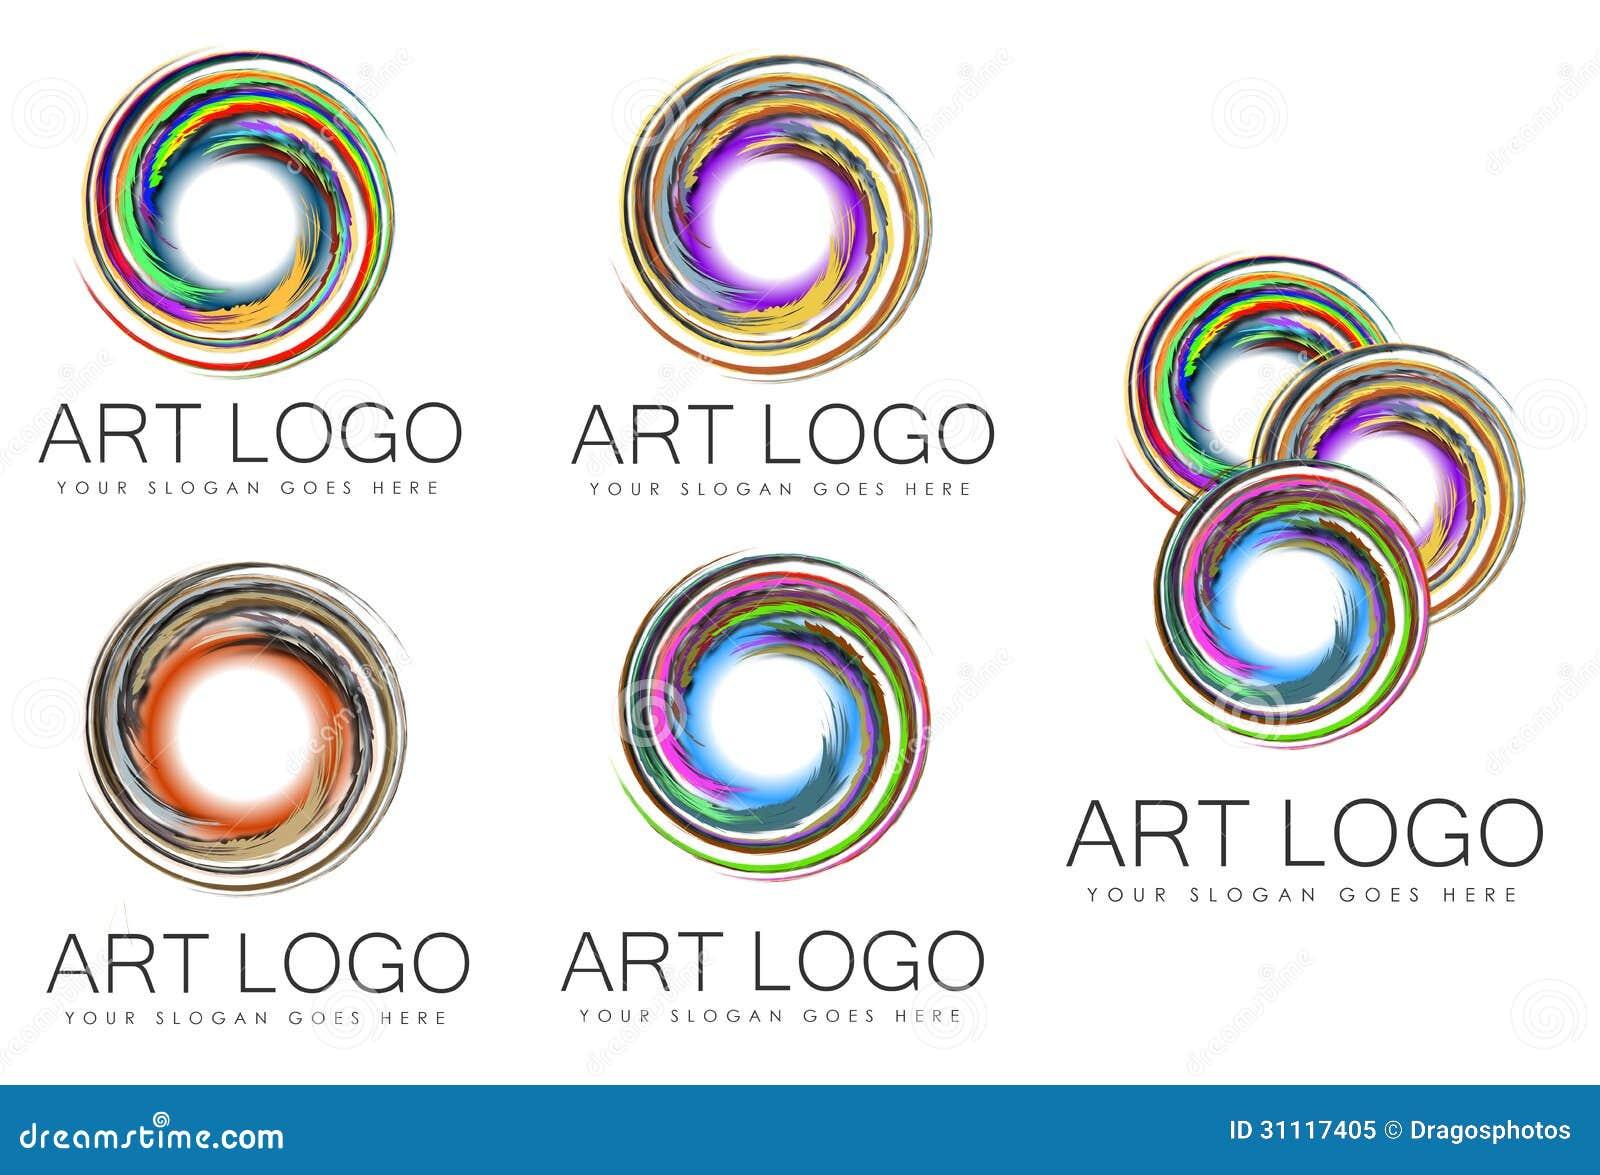 Set of swirl art logo designs stock illustration image for Painting and decorating logo ideas